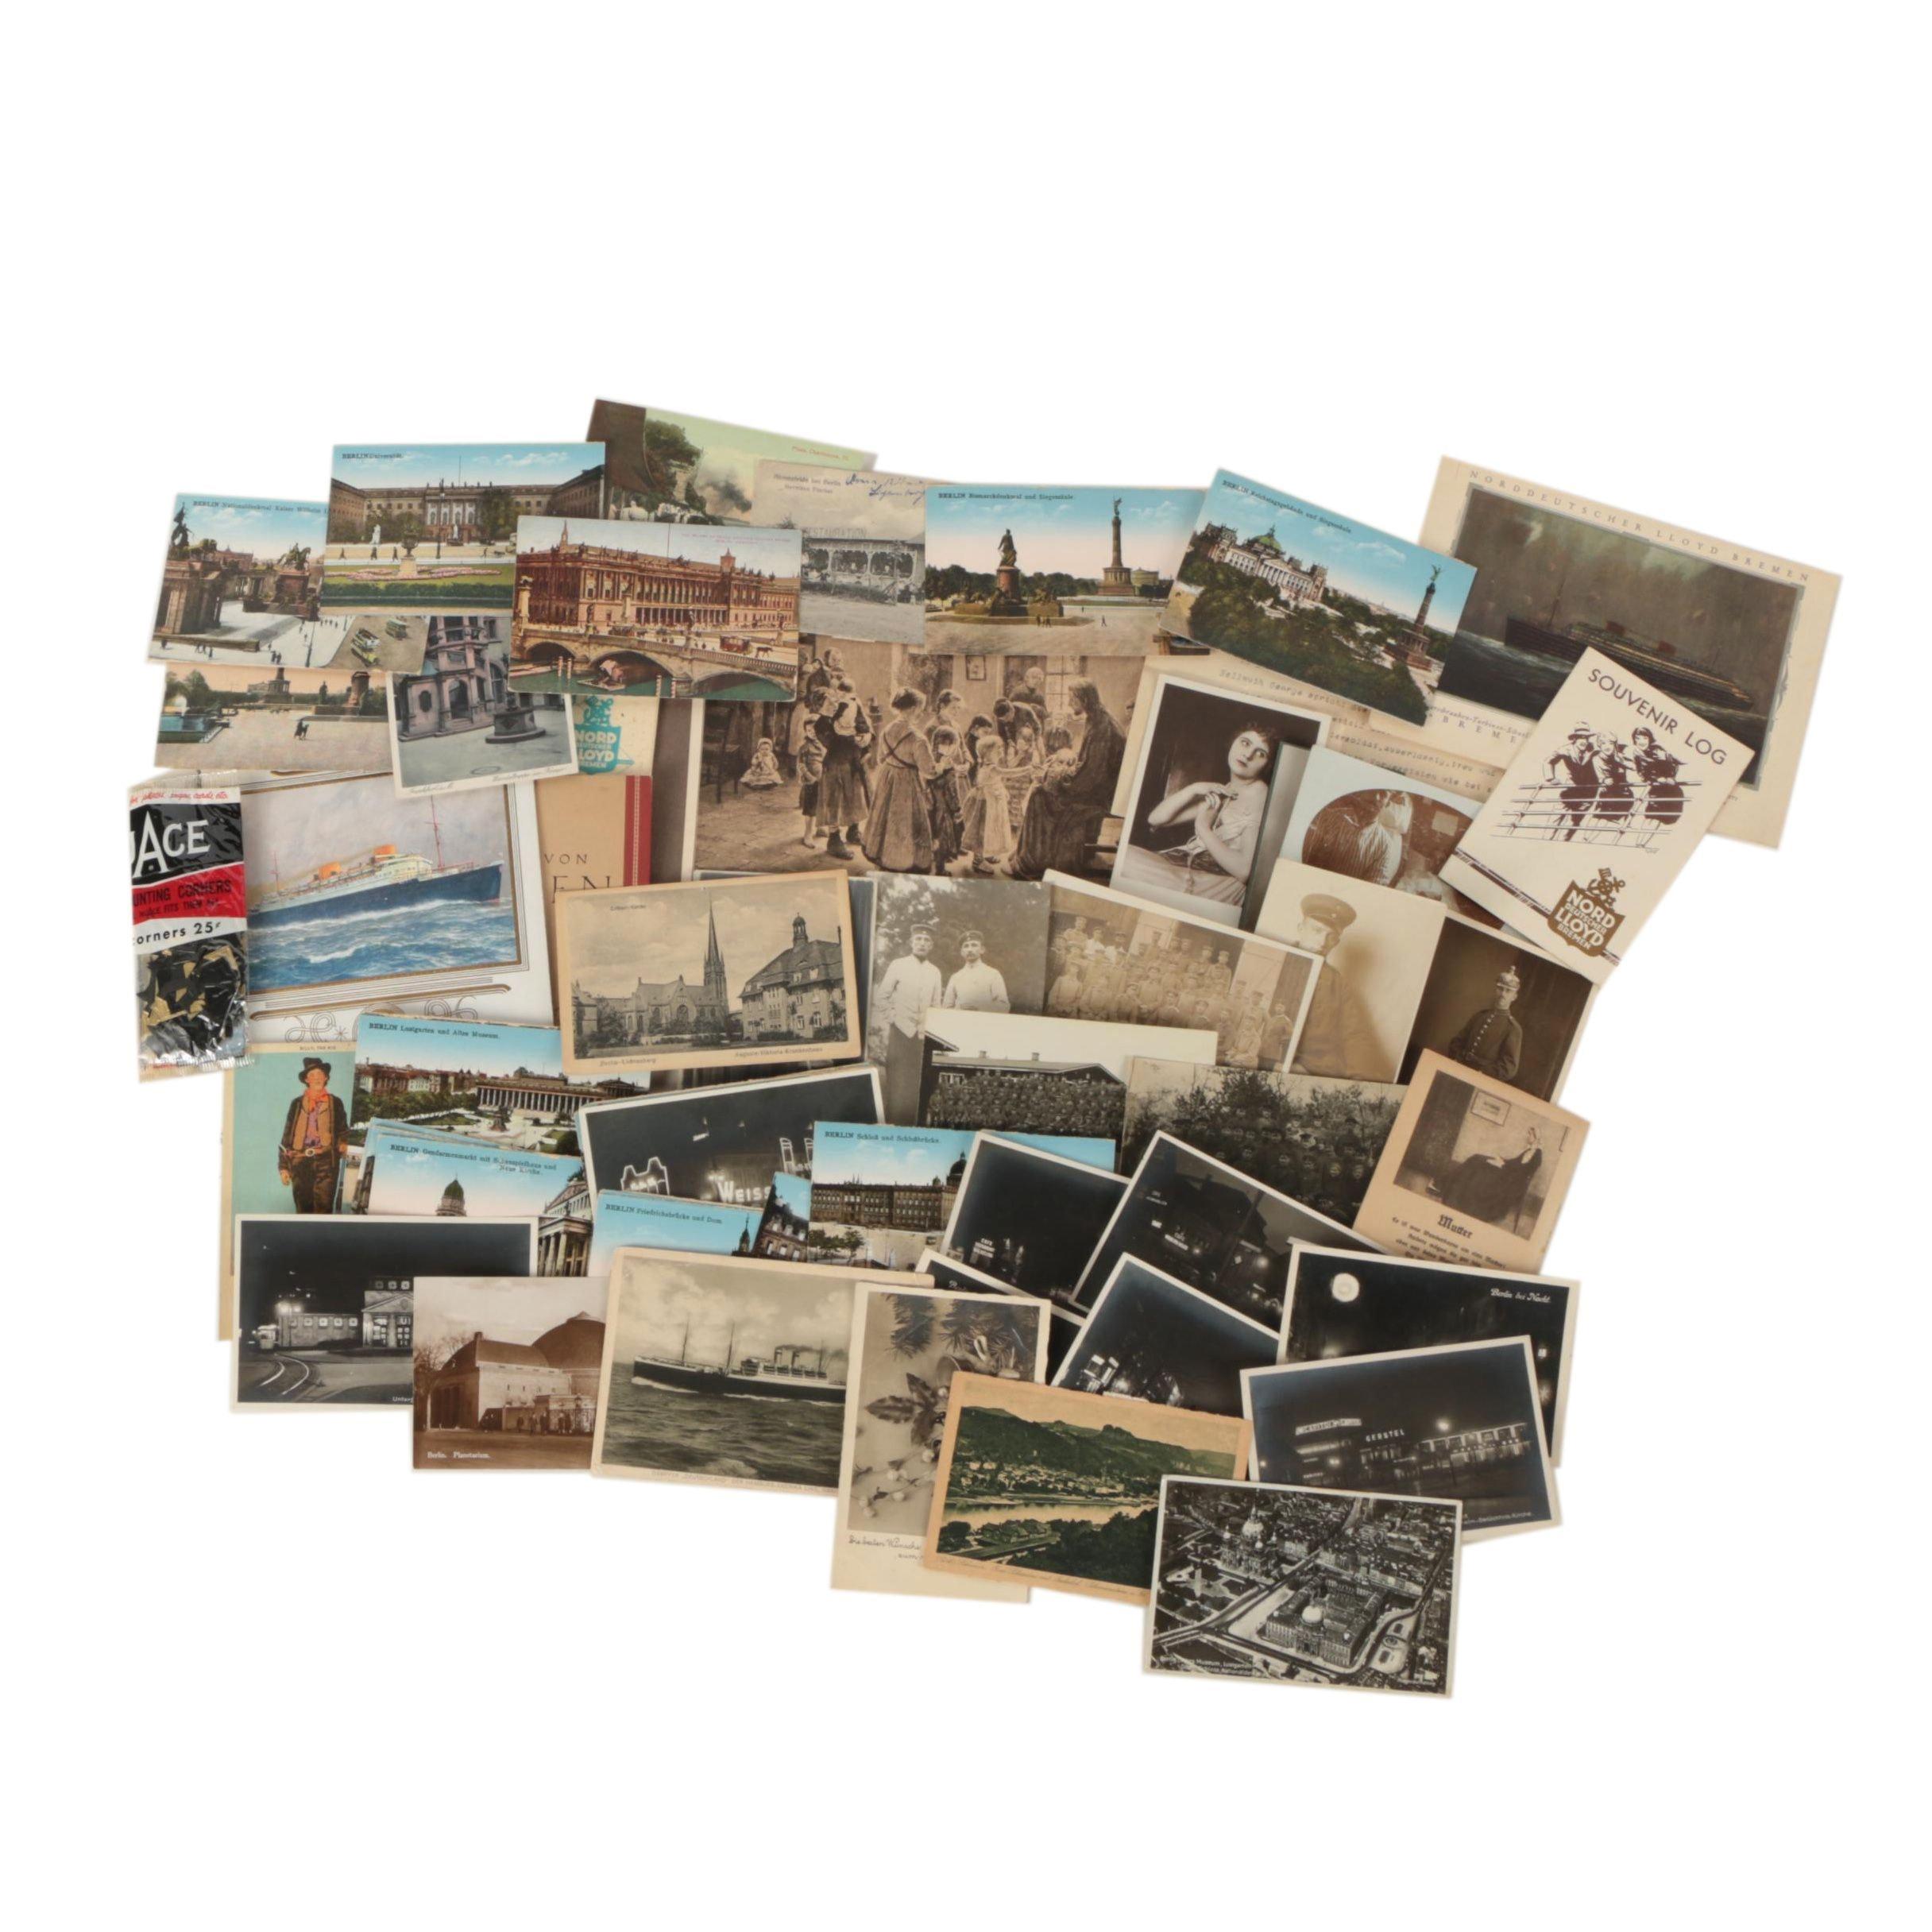 German Military Photographs, Postcards, and Cruise Ephemera